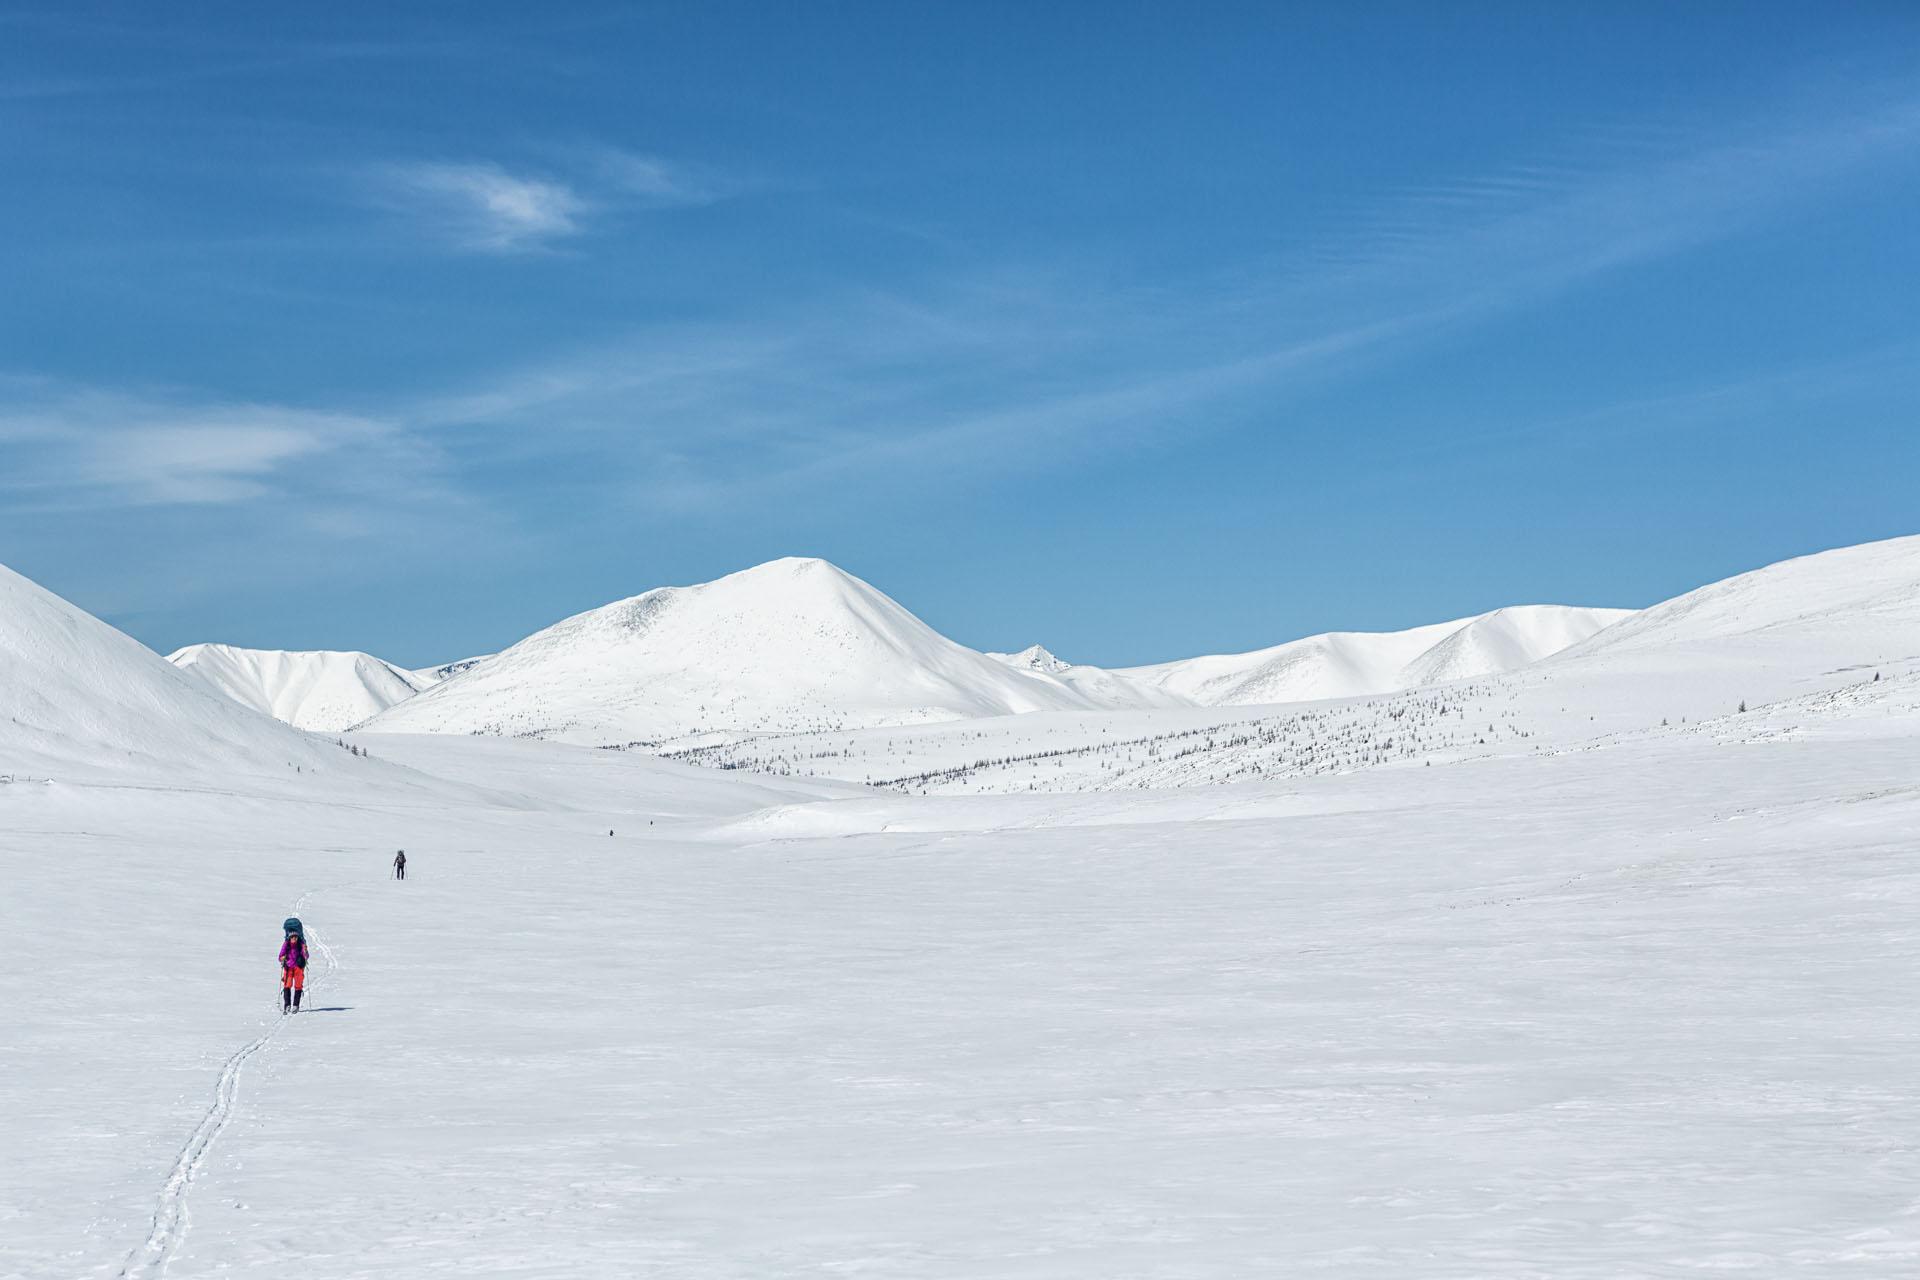 Rebecca Watters, Forrest McCarthy, Jason Wilmot and Gregg Treinish ski across White Pasture